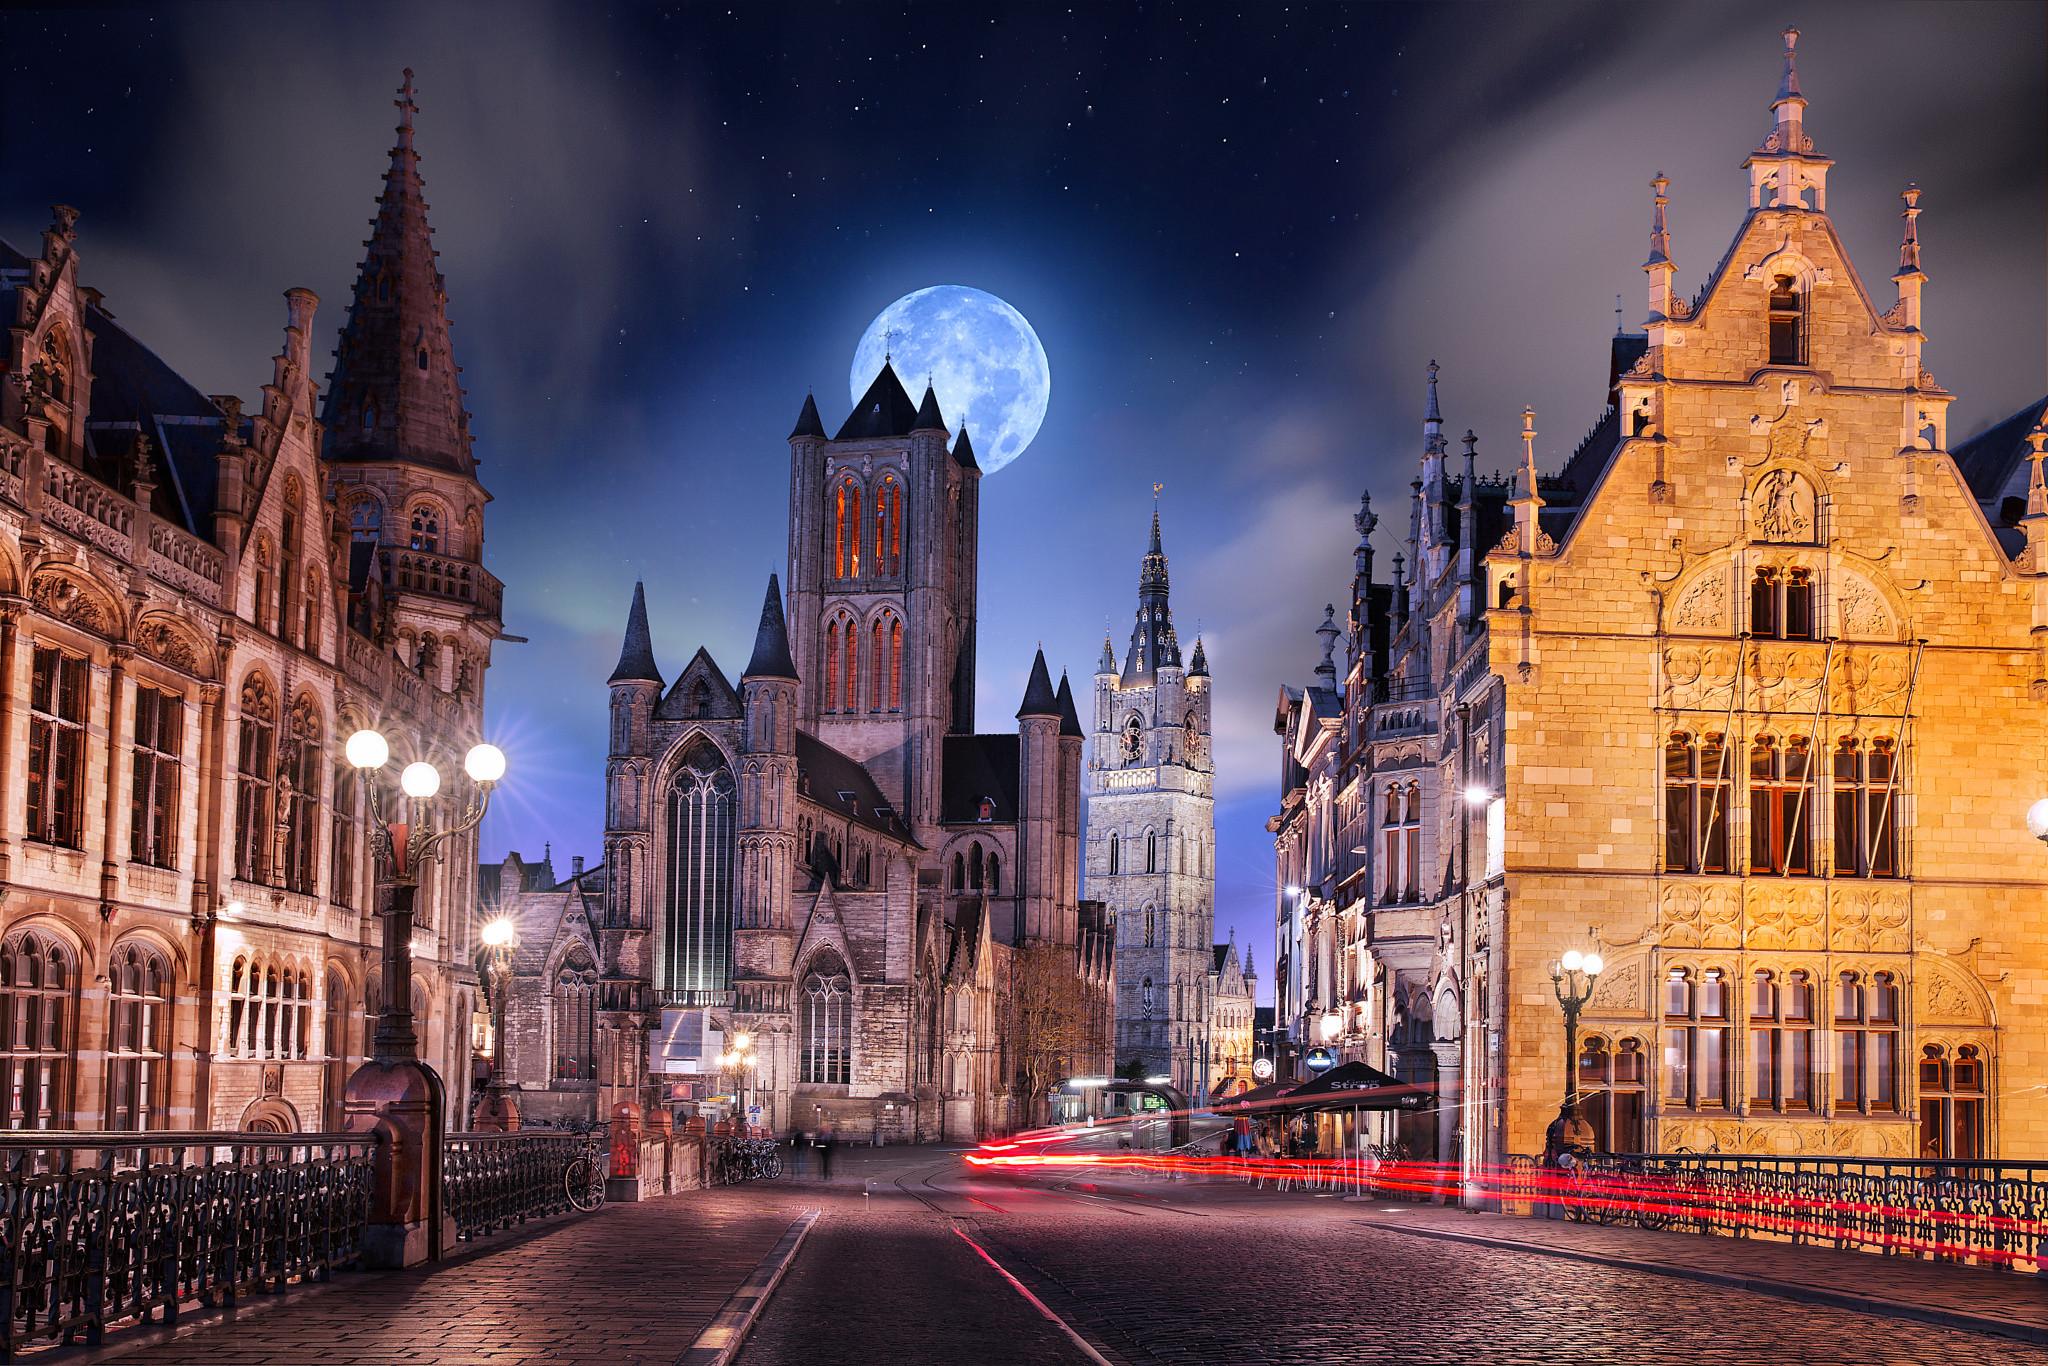 Gotham City – Belgium – Gent image work my instagram : ilhan1077  www.facebook.